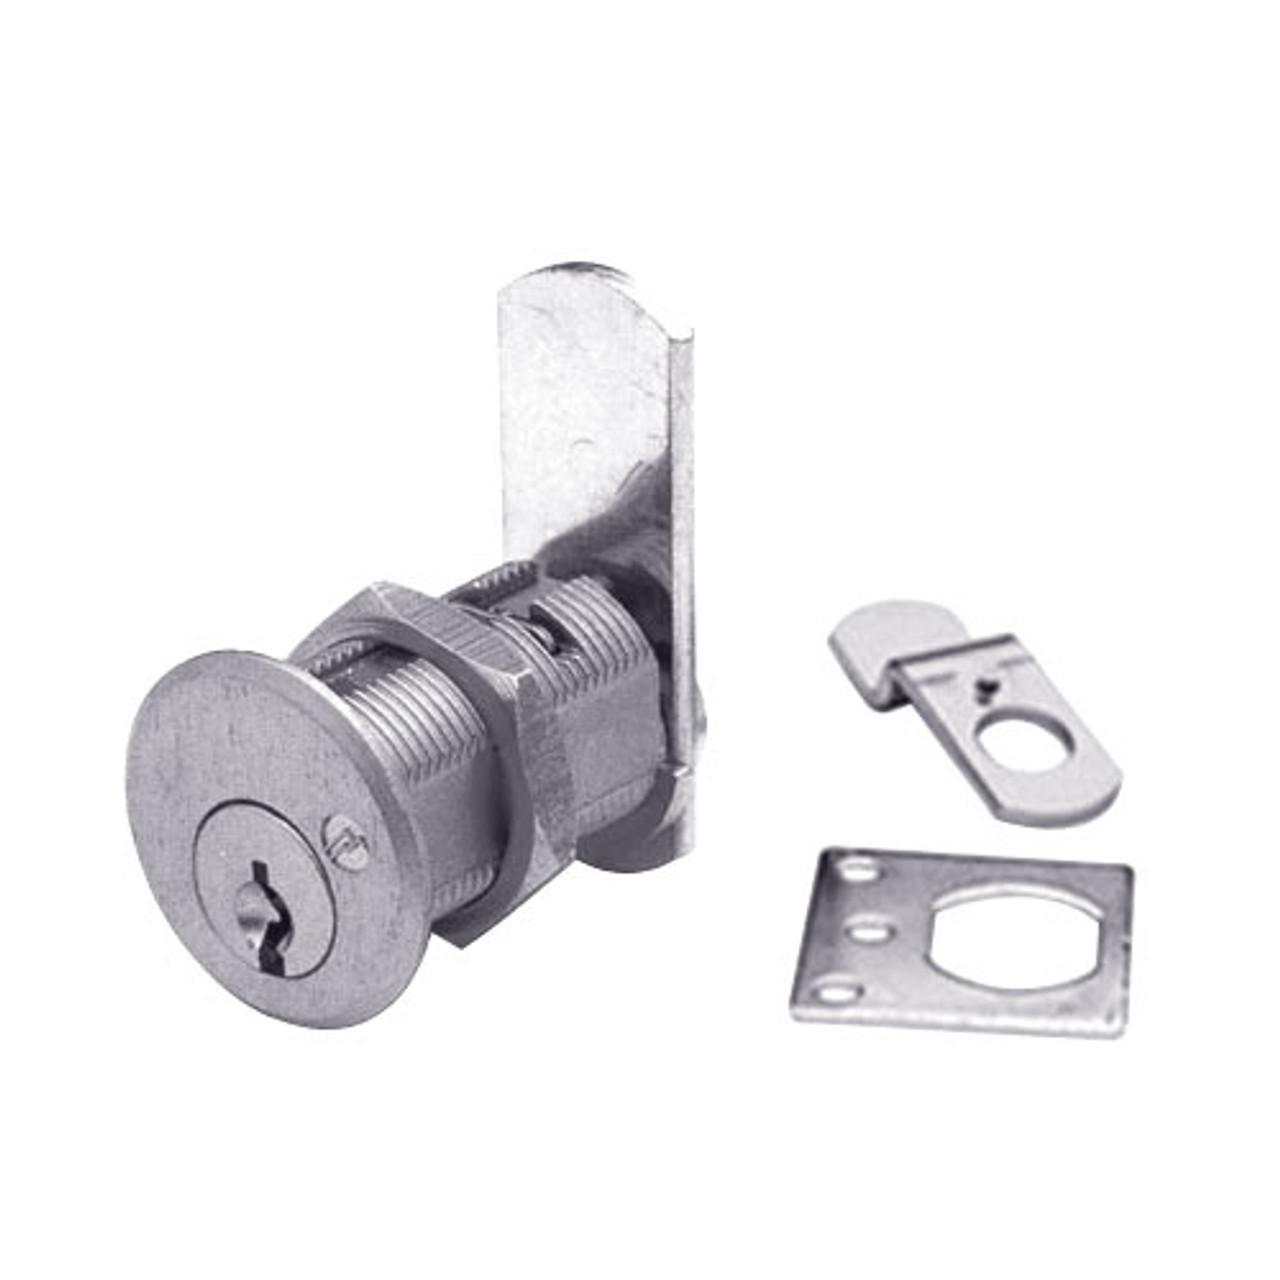 Olympus DCN4-KA107-26D Cam Locks in Satin Chrome Finish